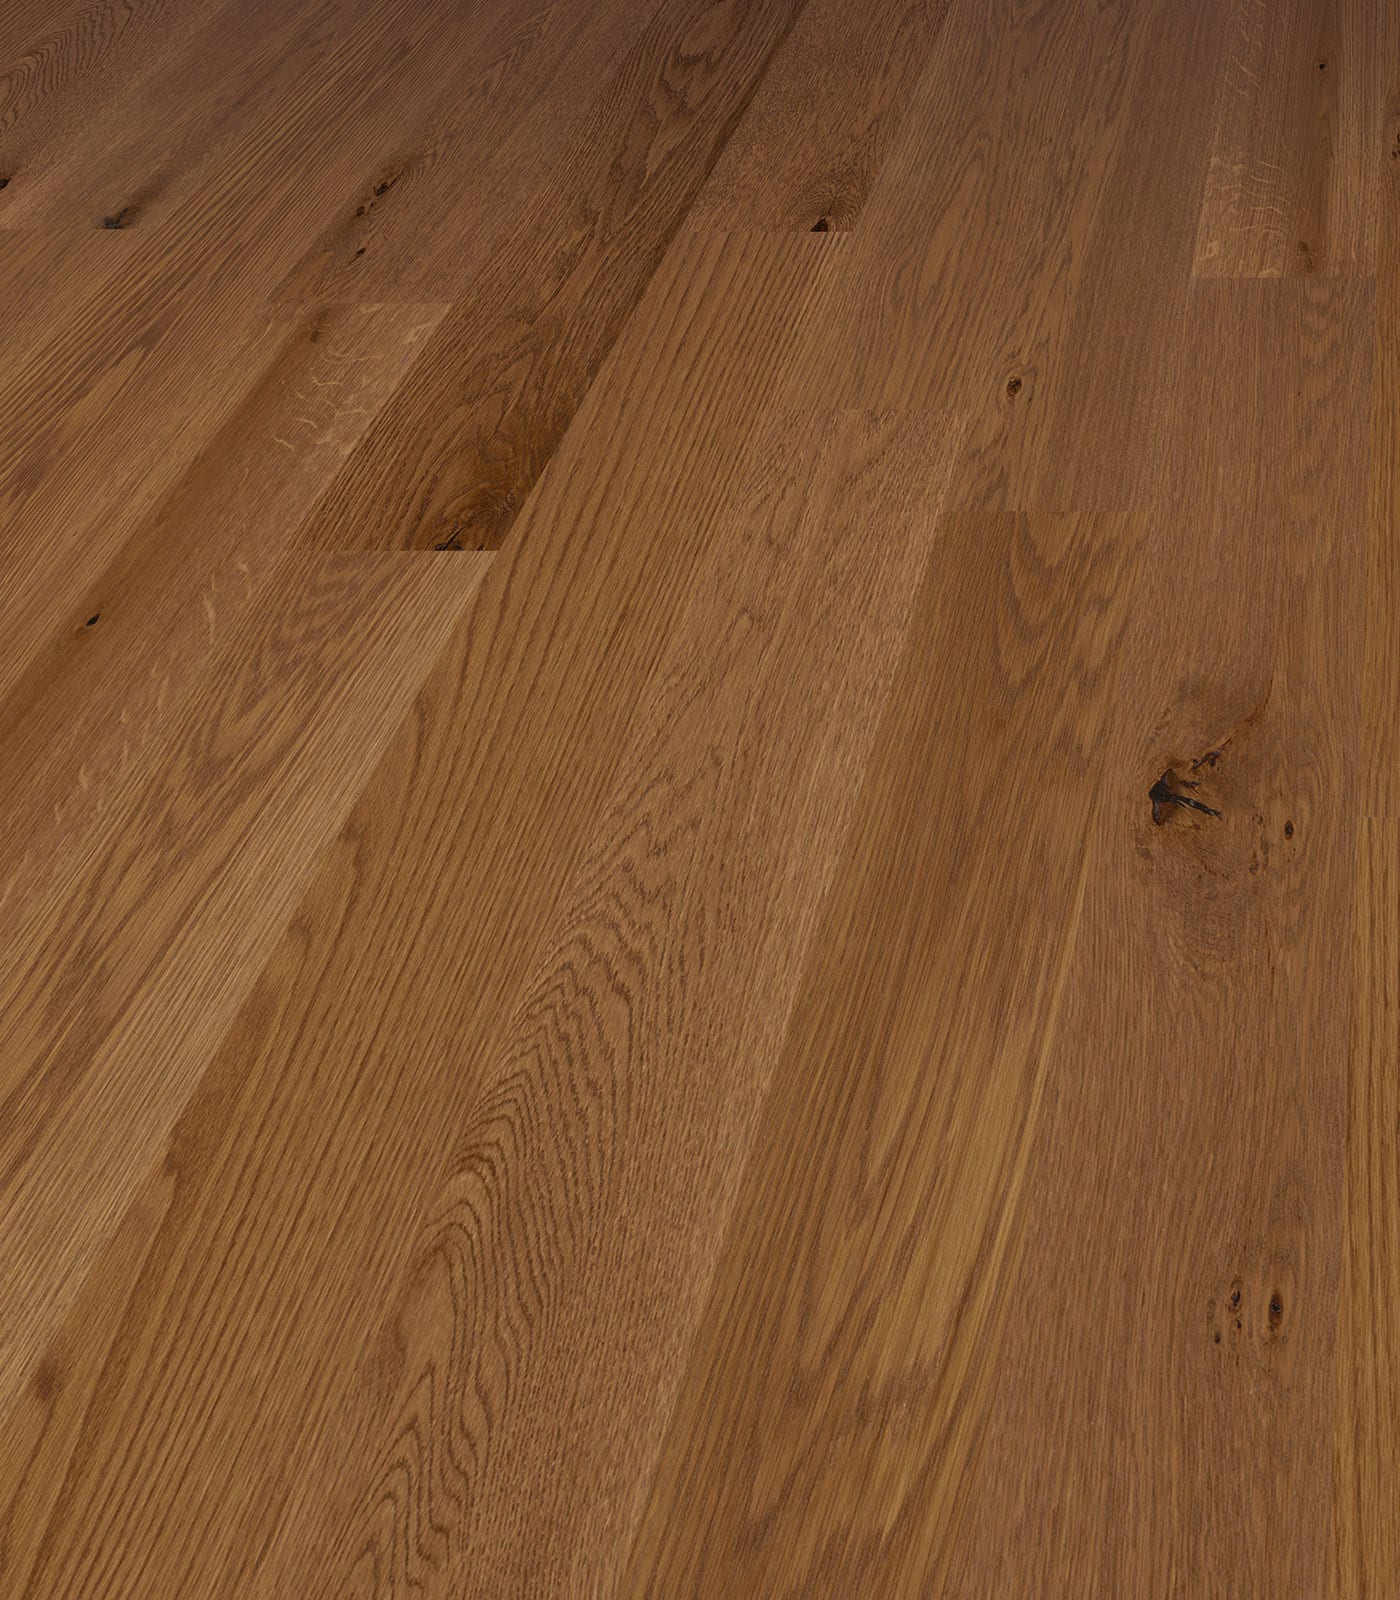 Harvest-European oak floors-Color Collection-angle